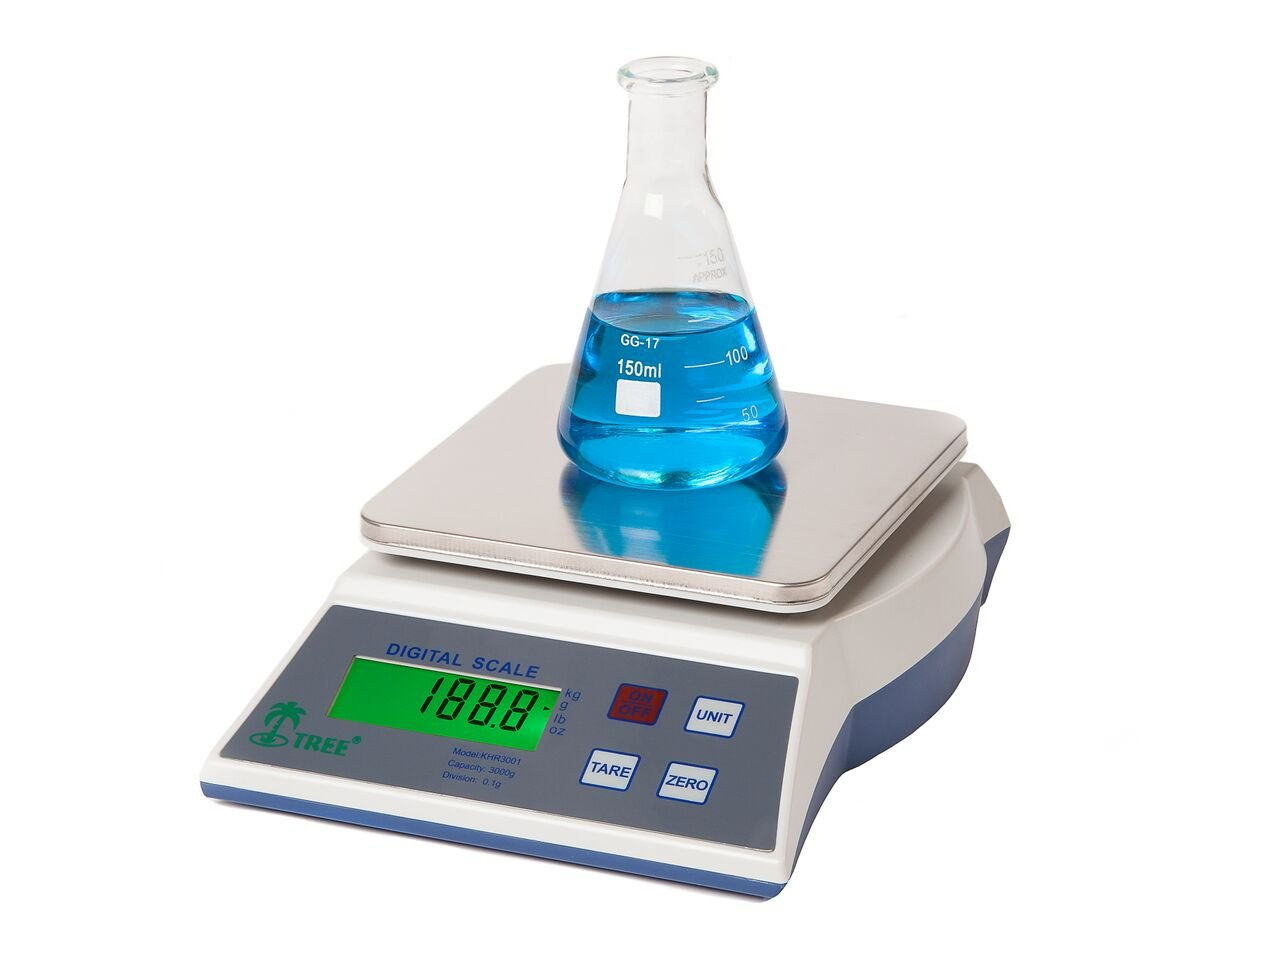 KMR-6000 -- 6000g x 1 g Laboratory Balance LW Measurements Europe Ltd KMR6000